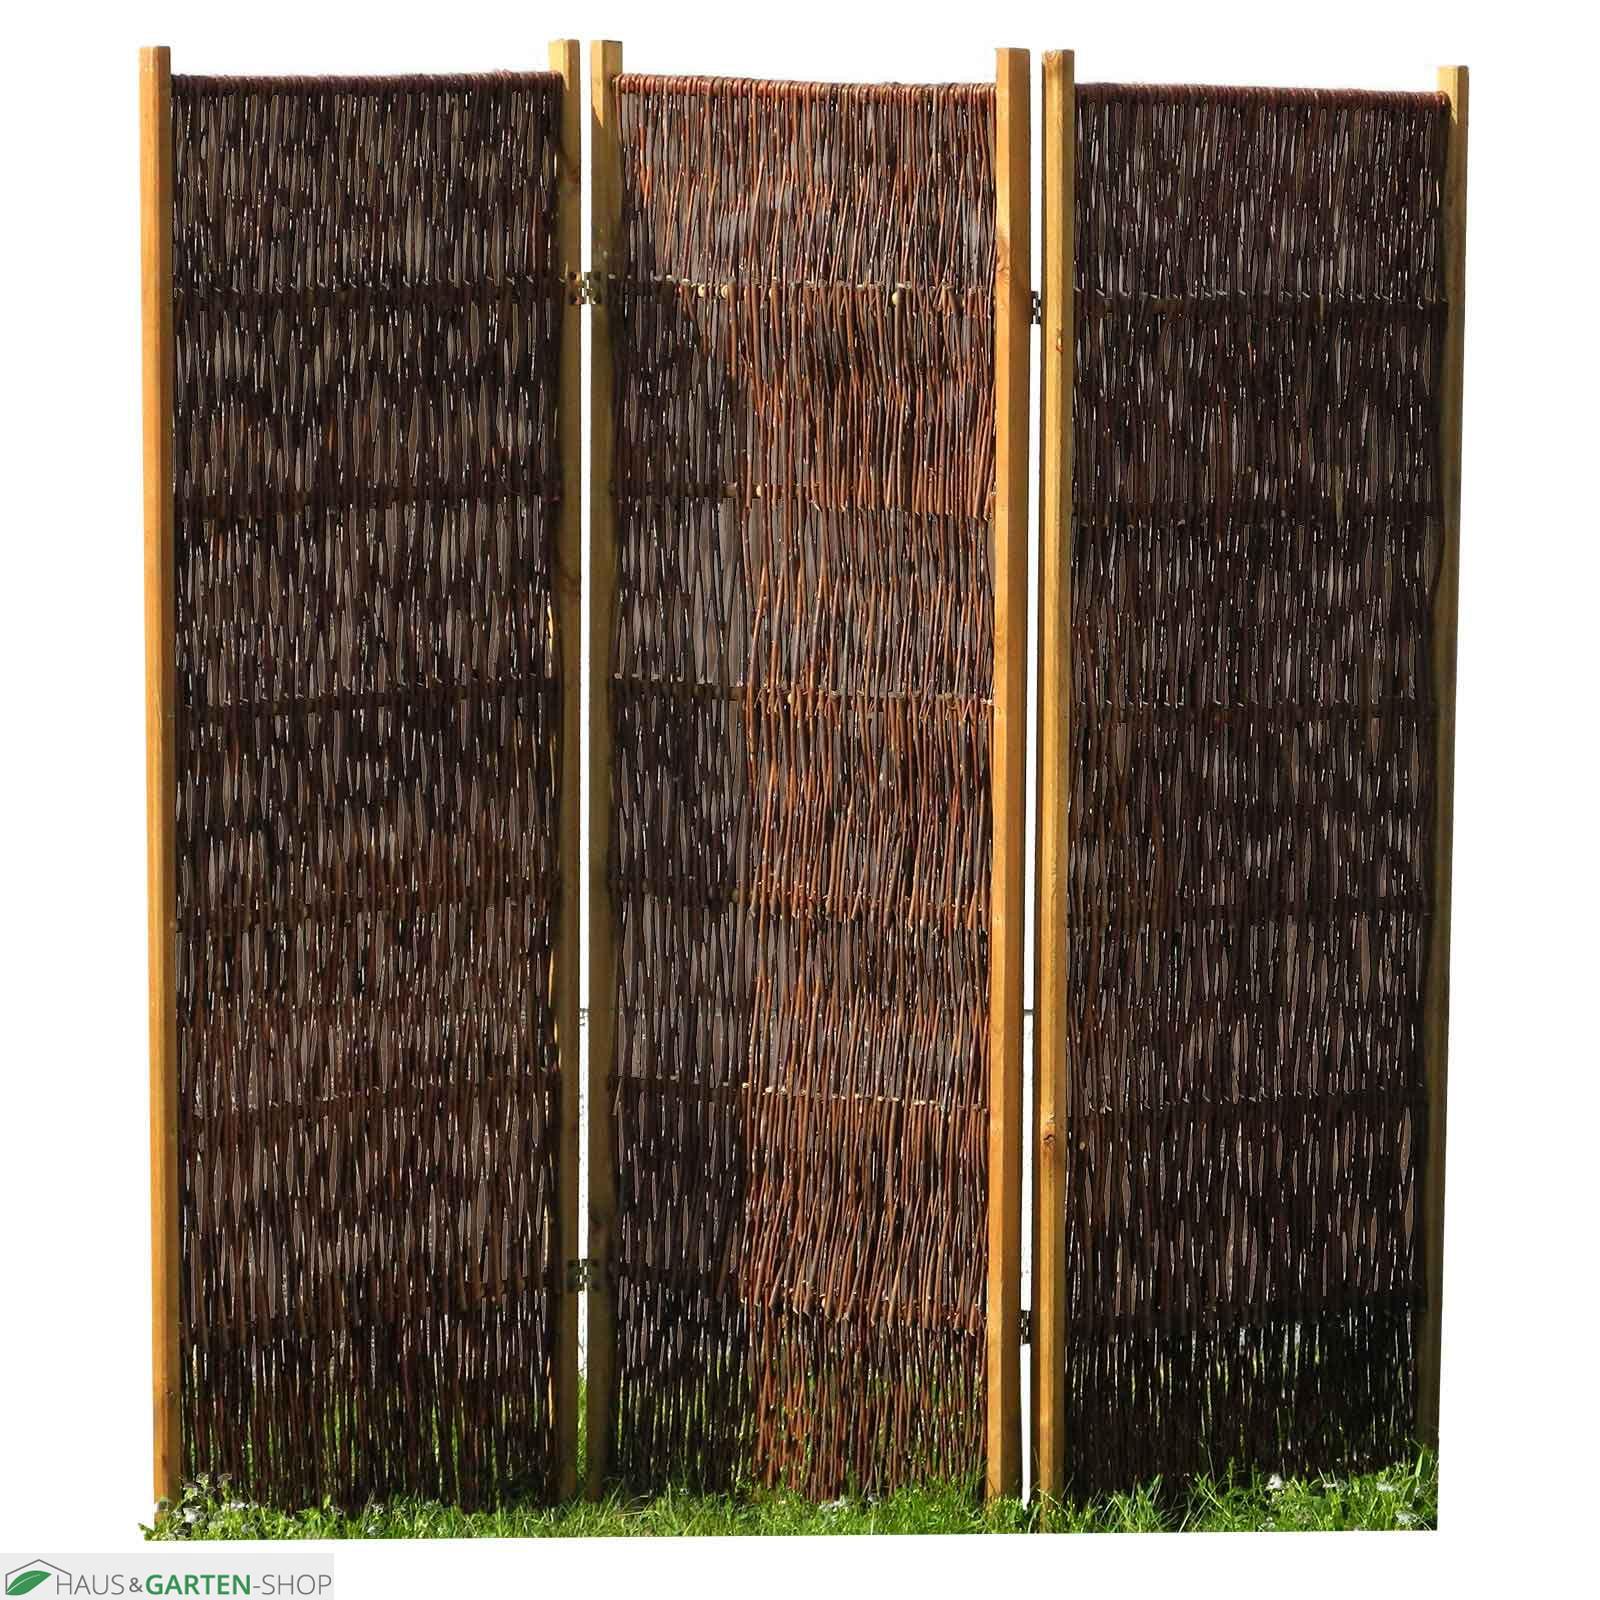 Full Size of Paravent Bambus Balkon Sichtschutzlsung Aus Weide Haselnuss Garten Bett Wohnzimmer Paravent Bambus Balkon